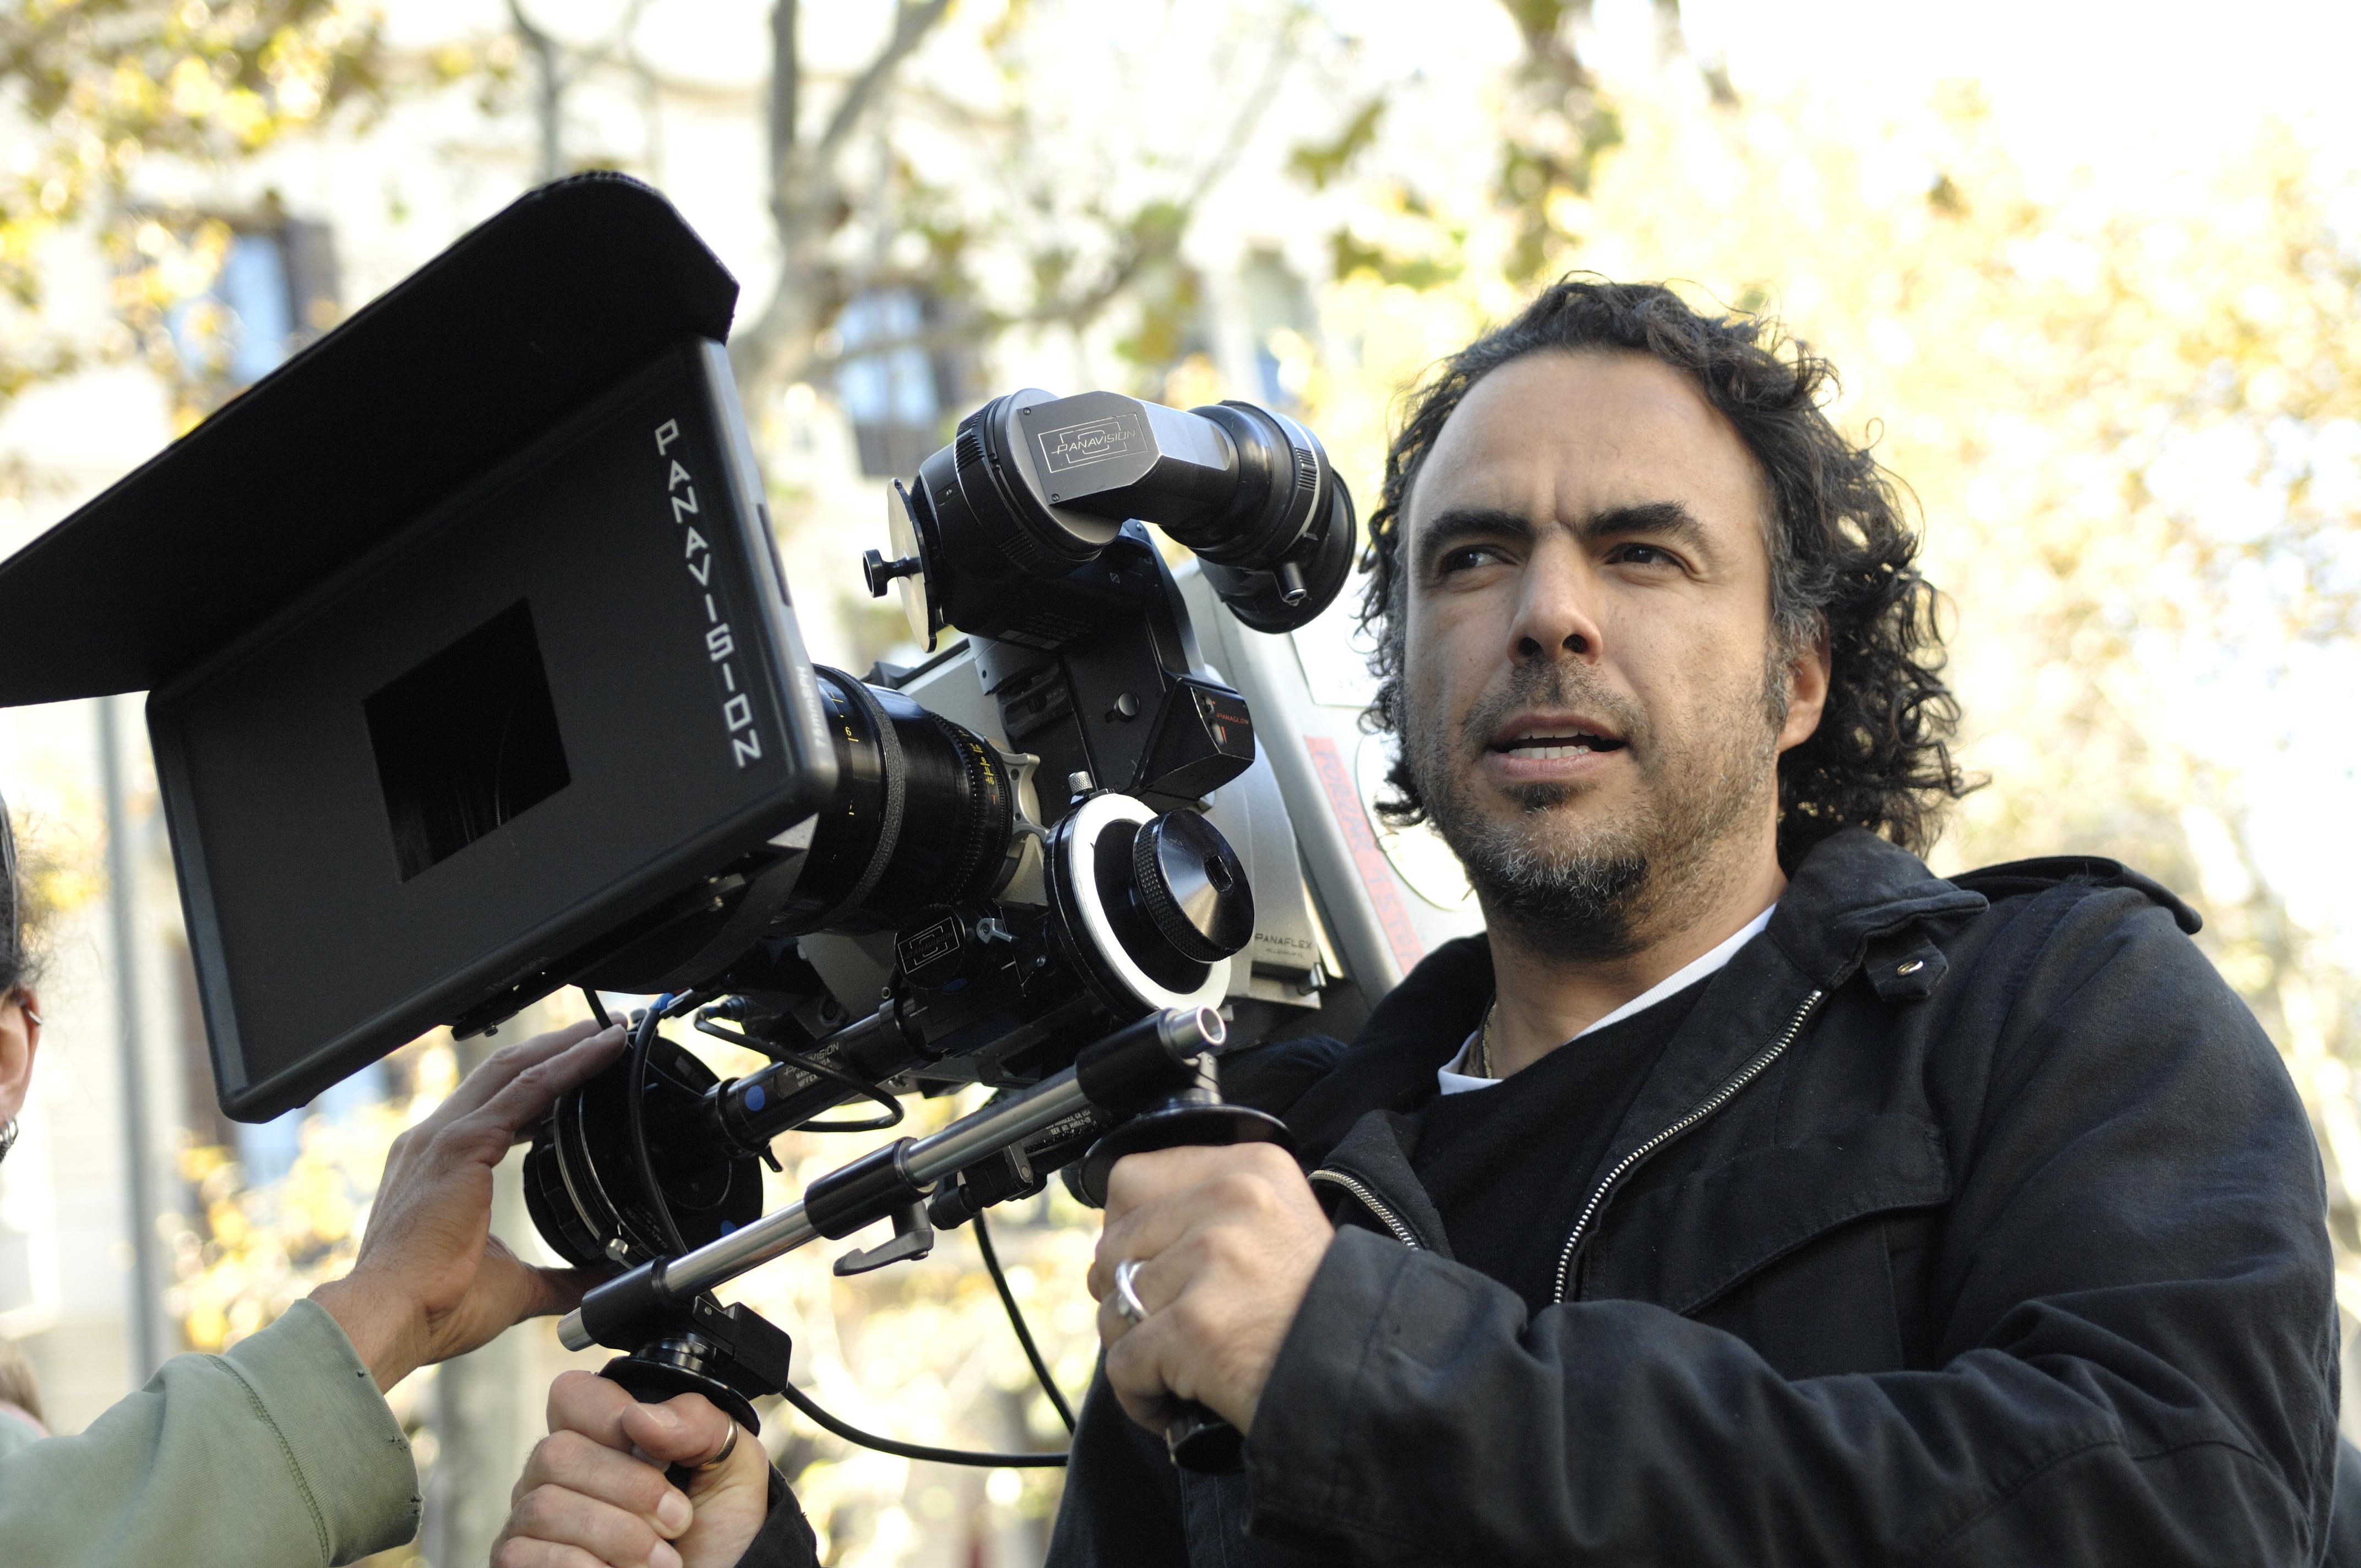 Alejandro Gonzalez Inarritu films on the set of 'Birdman'